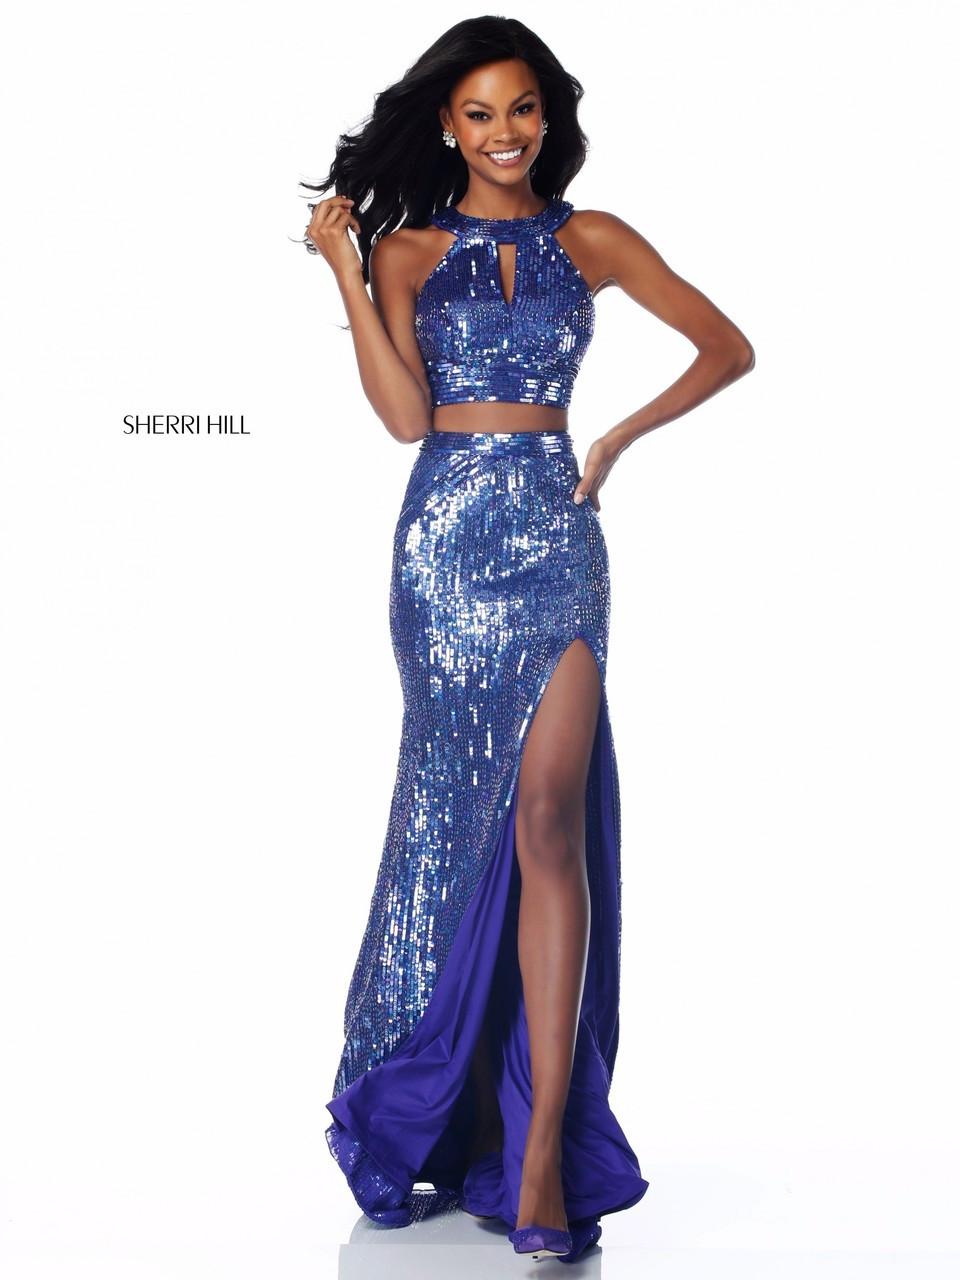 6f159c49c3c56 Sherri Hill 51756 - B Chic Fashions